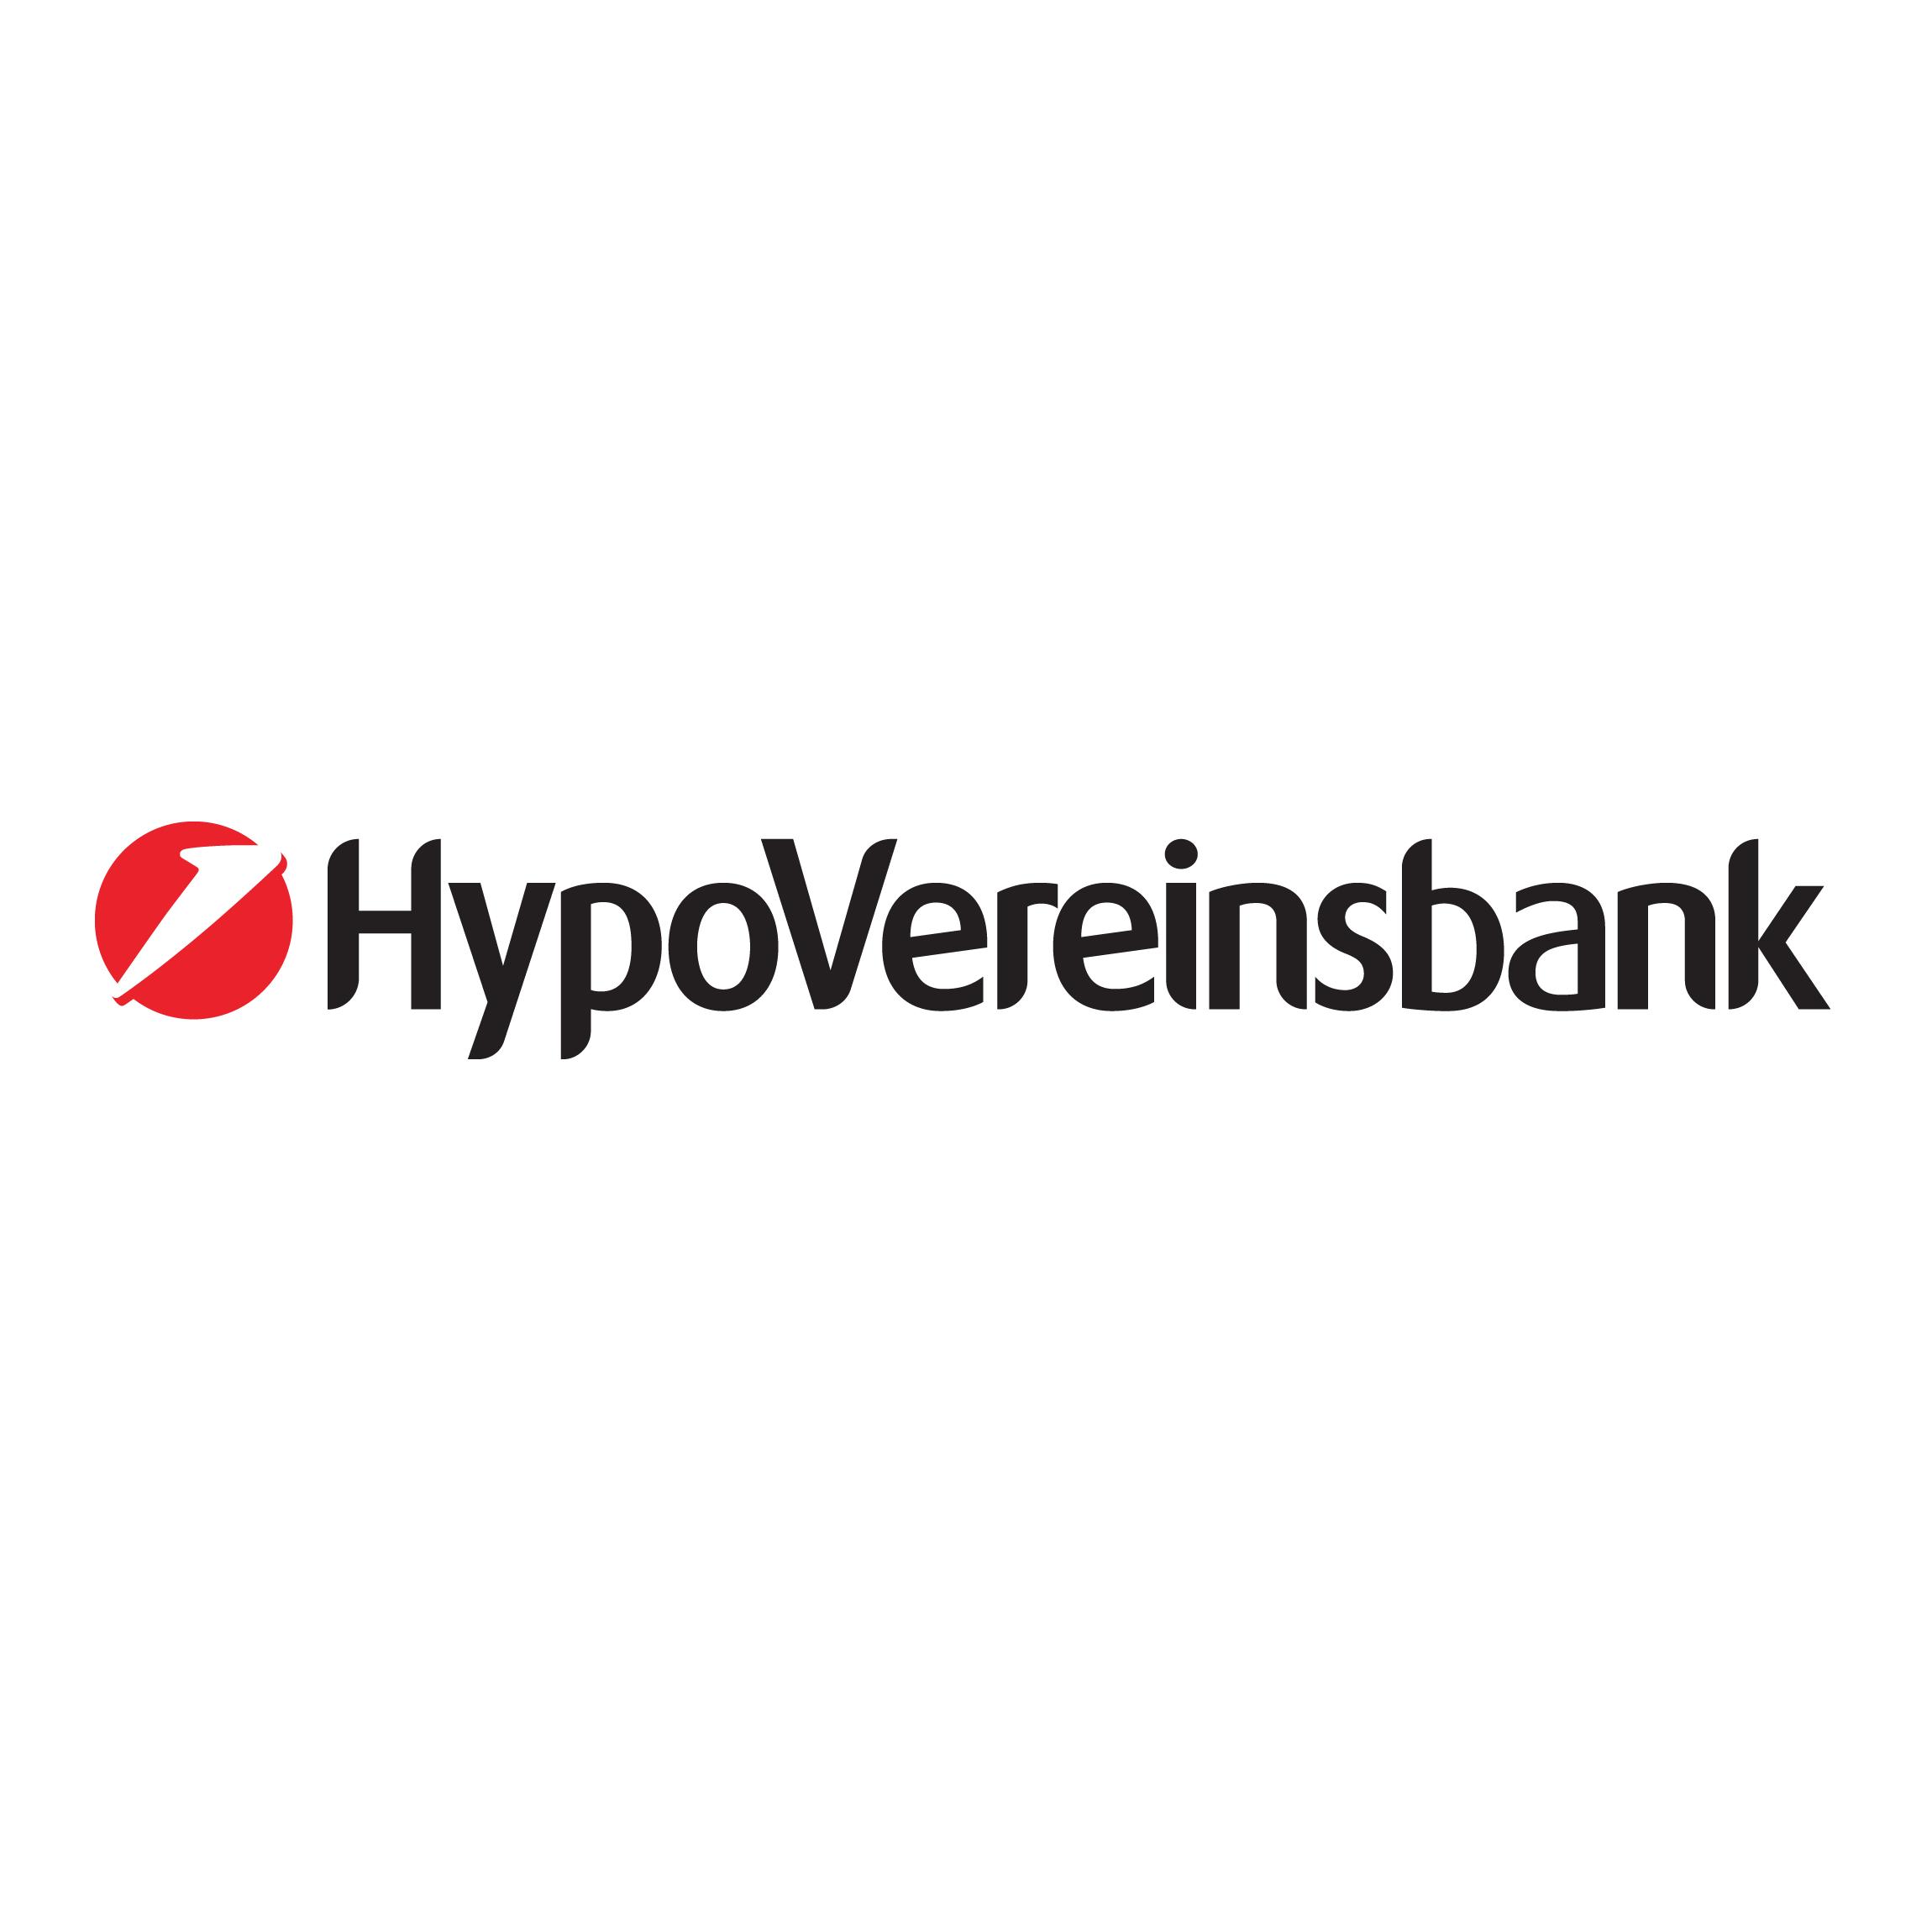 HypoVereinsbank Private Banking Erding